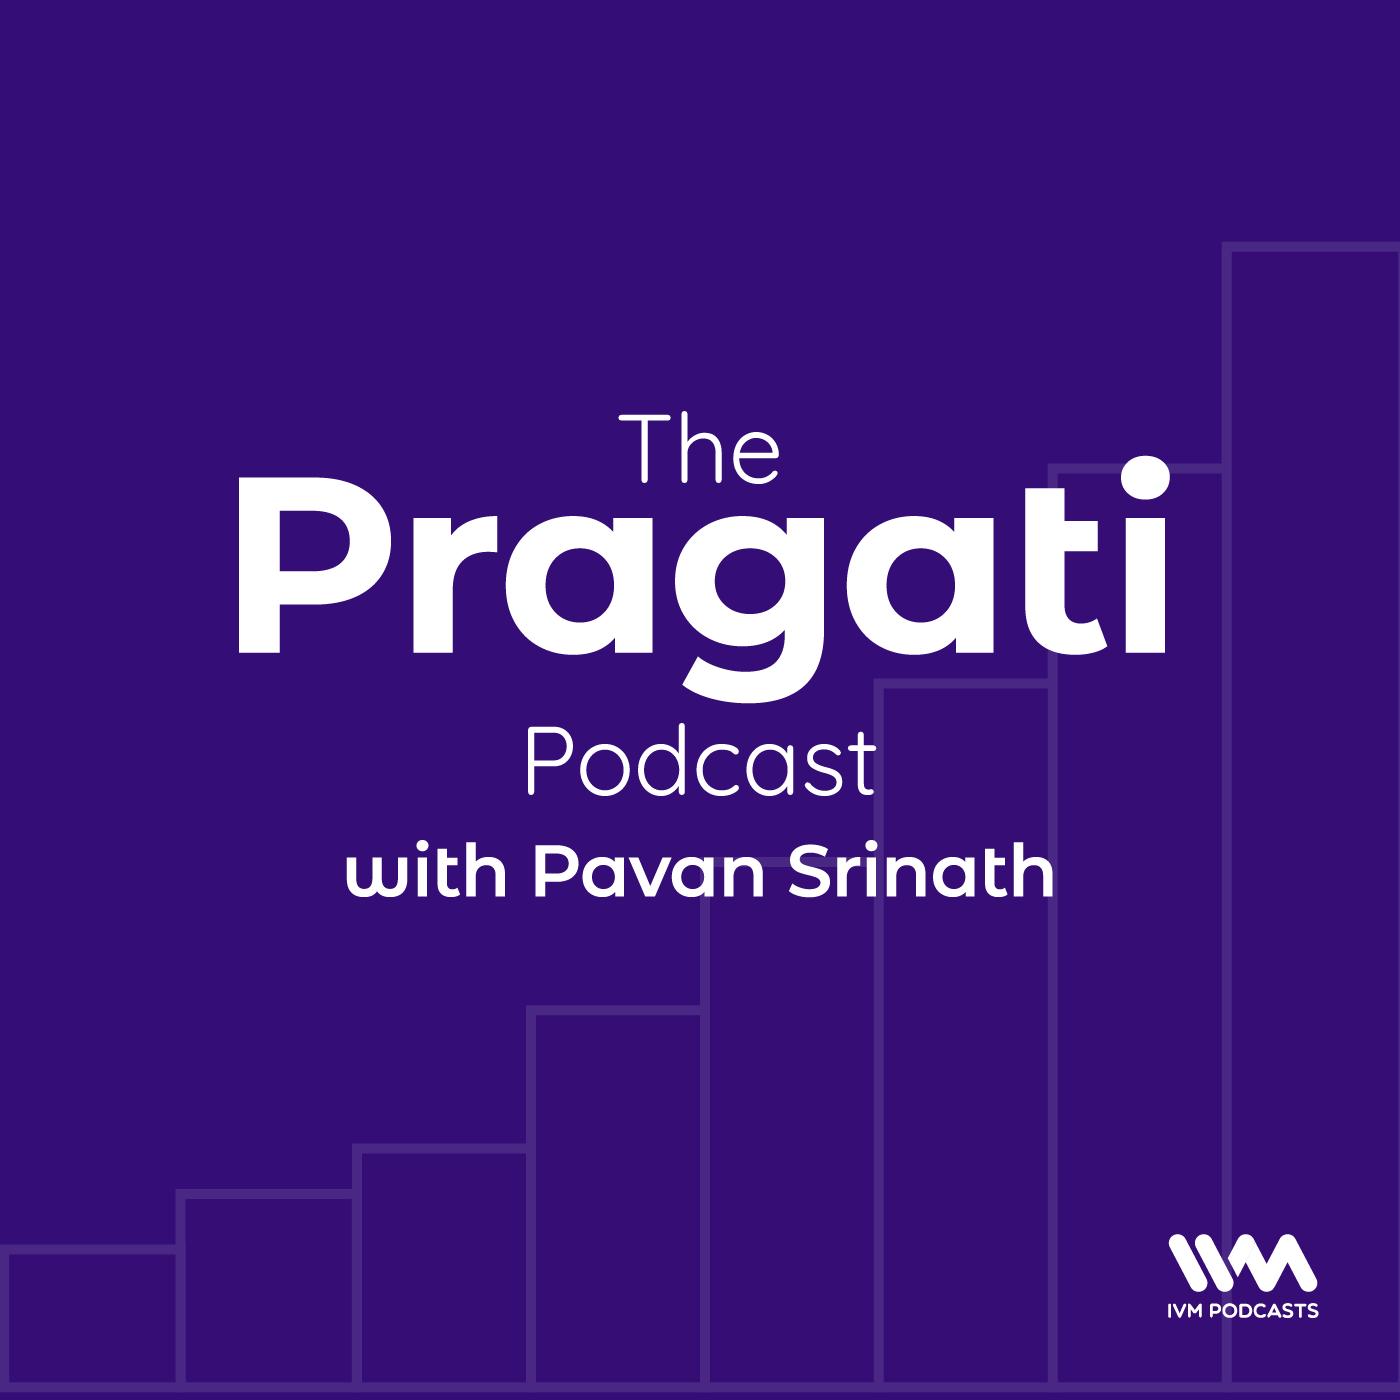 The Pragati Podcast show art